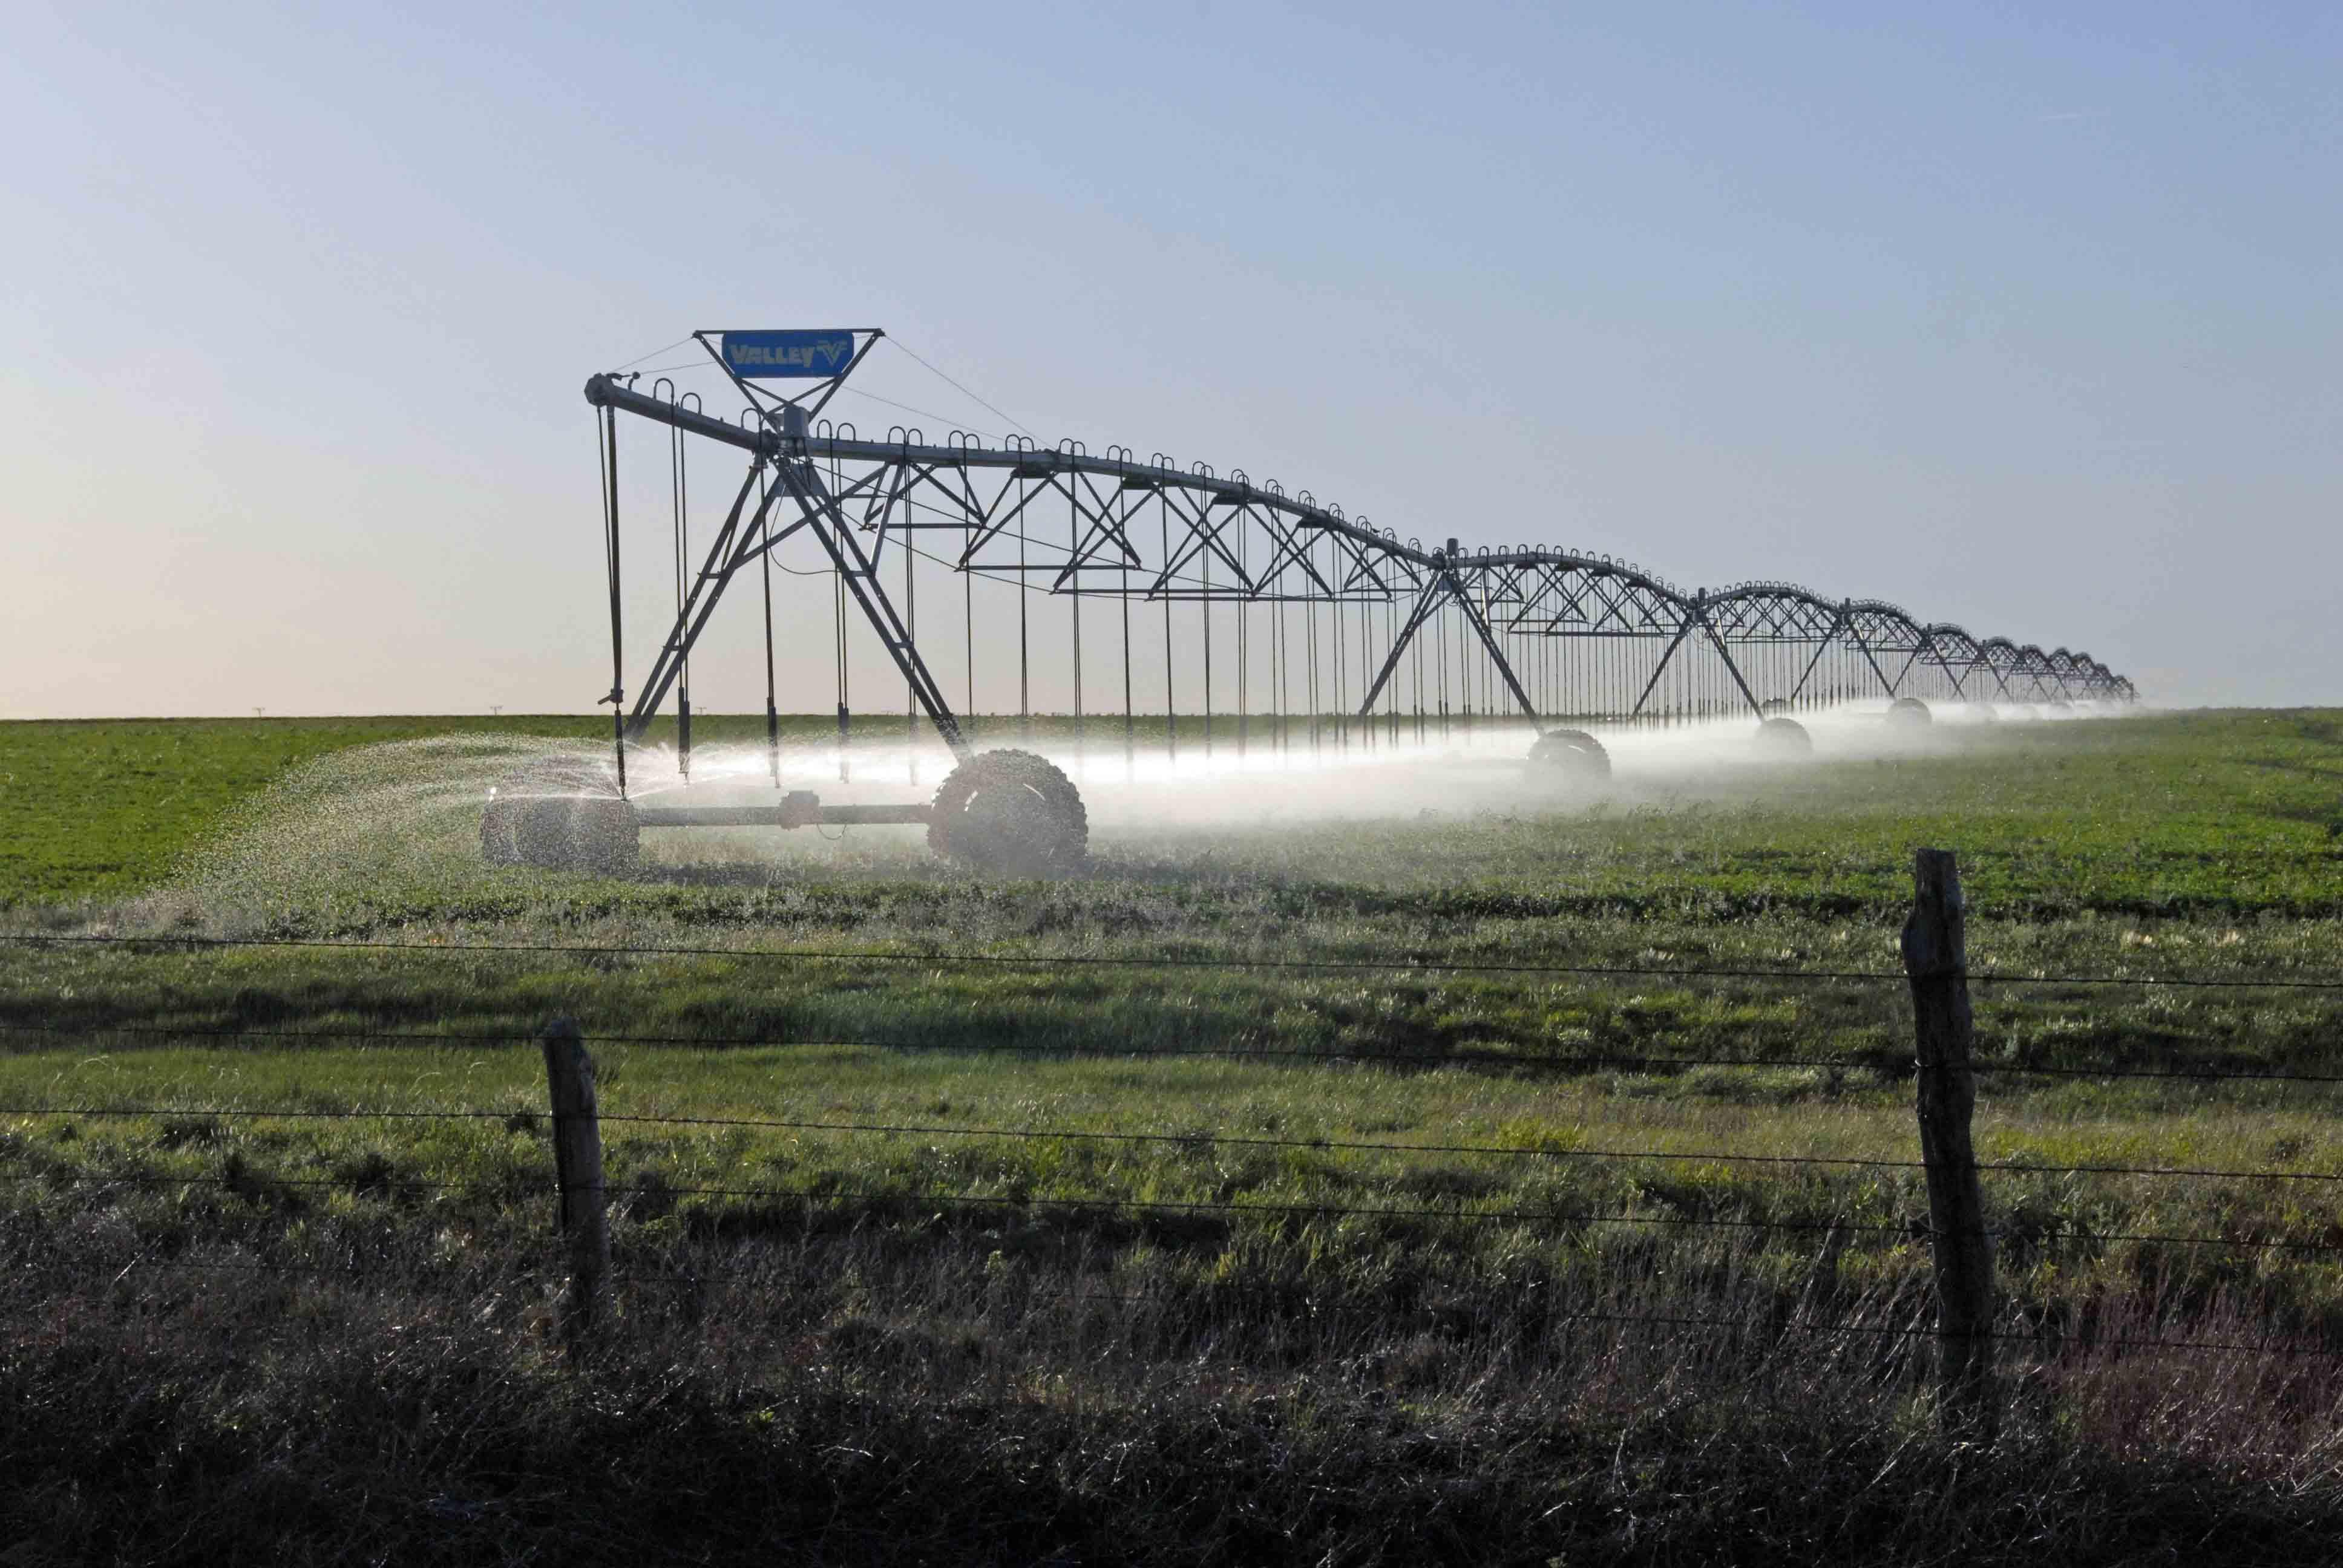 Irrigating a Texas cotton field